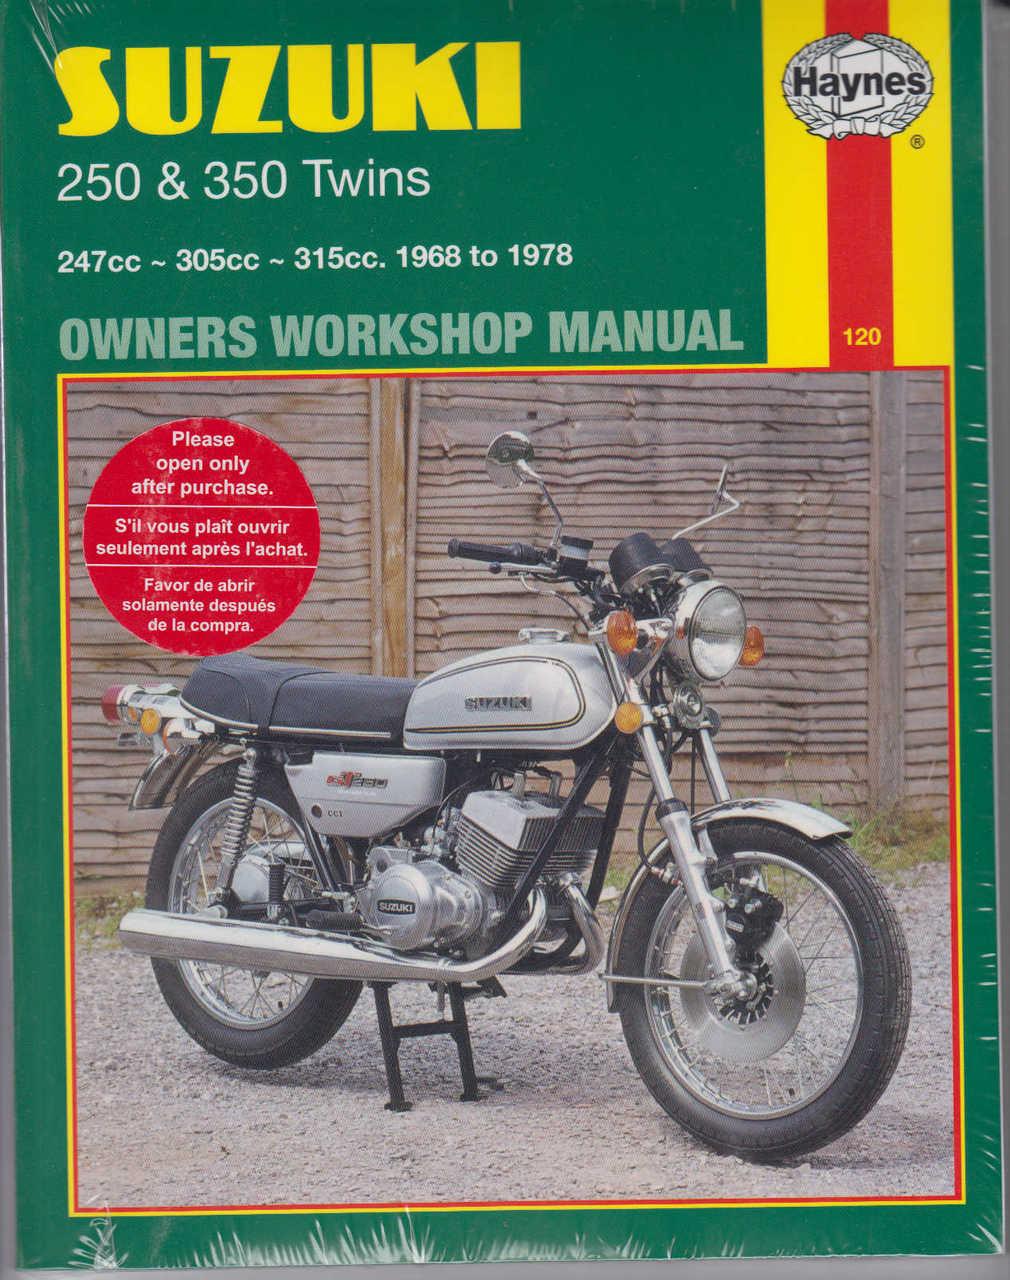 suzuki t250 gt250 t305 amp t350 twins 1968 1978 workshop manual rh automotobookshop com au suzuki gt 250 service manual pdf suzuki gt 250 repair manual